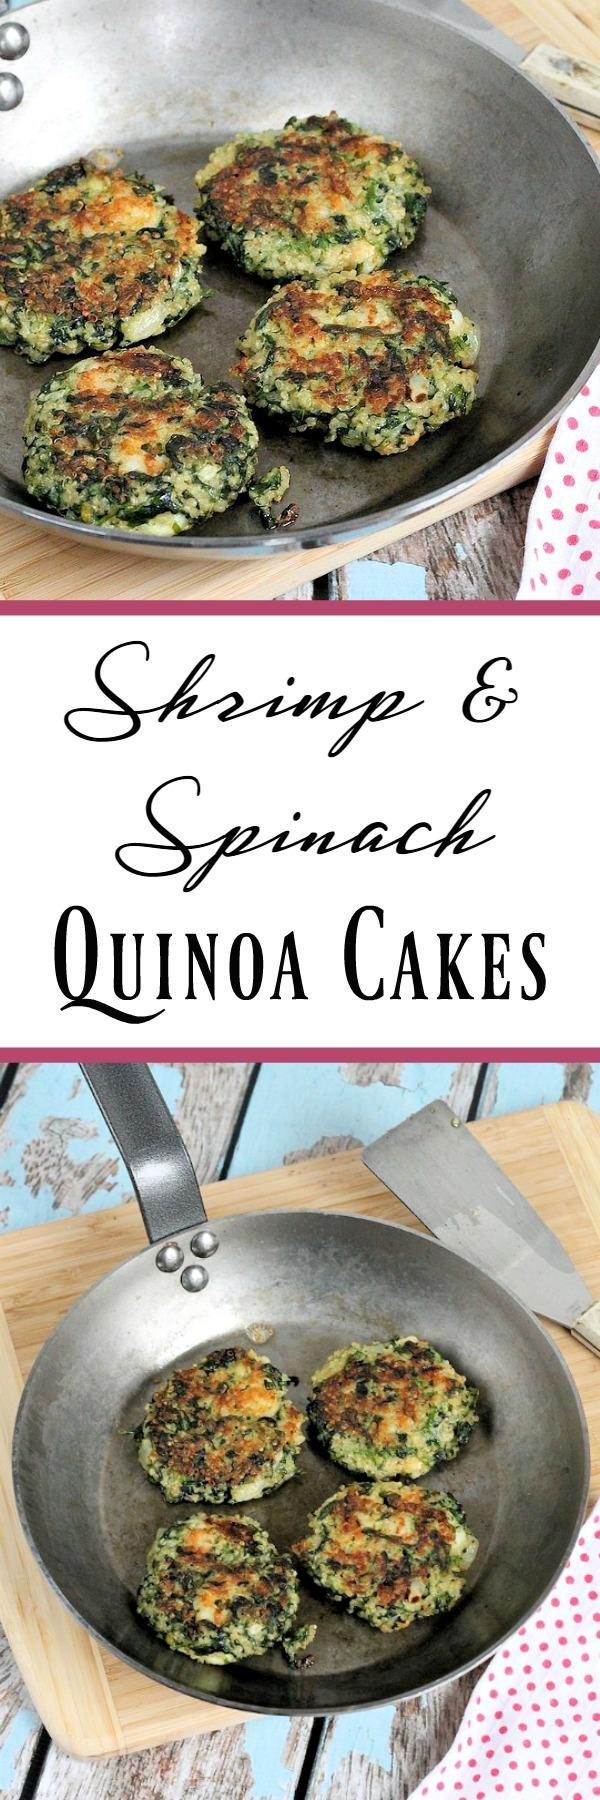 Shrimp & Spinach Quinoa Cakes